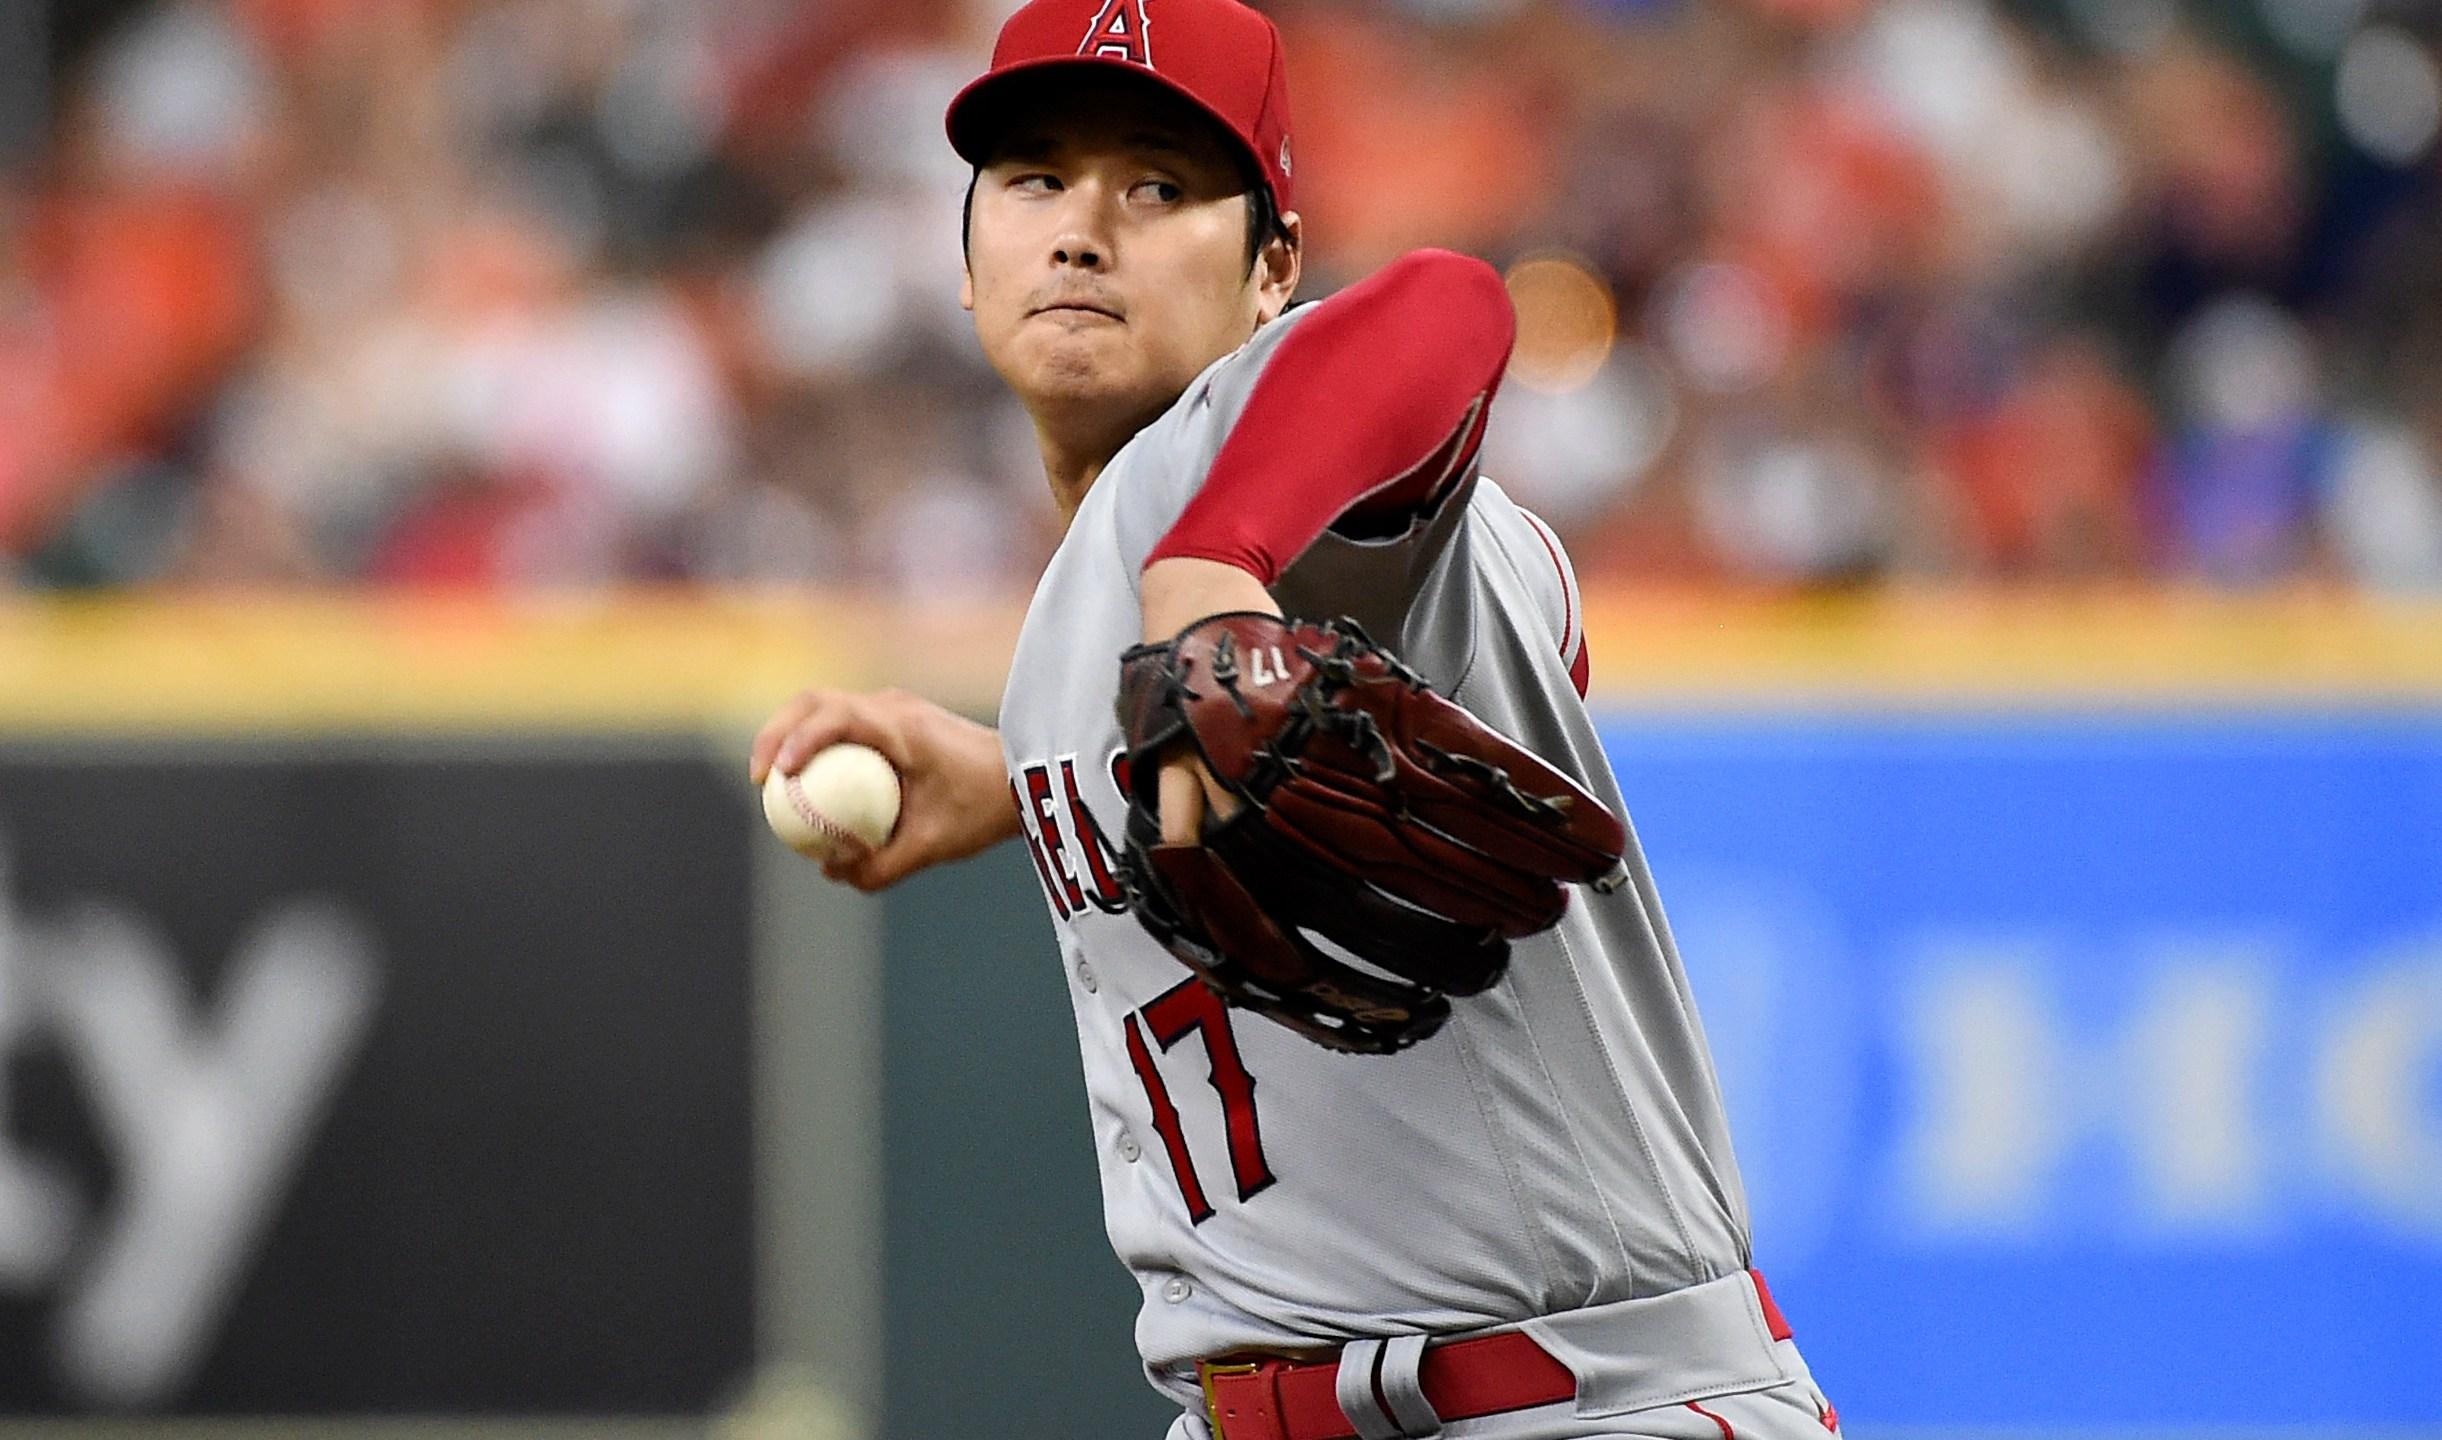 Shohei Ohtani, player here